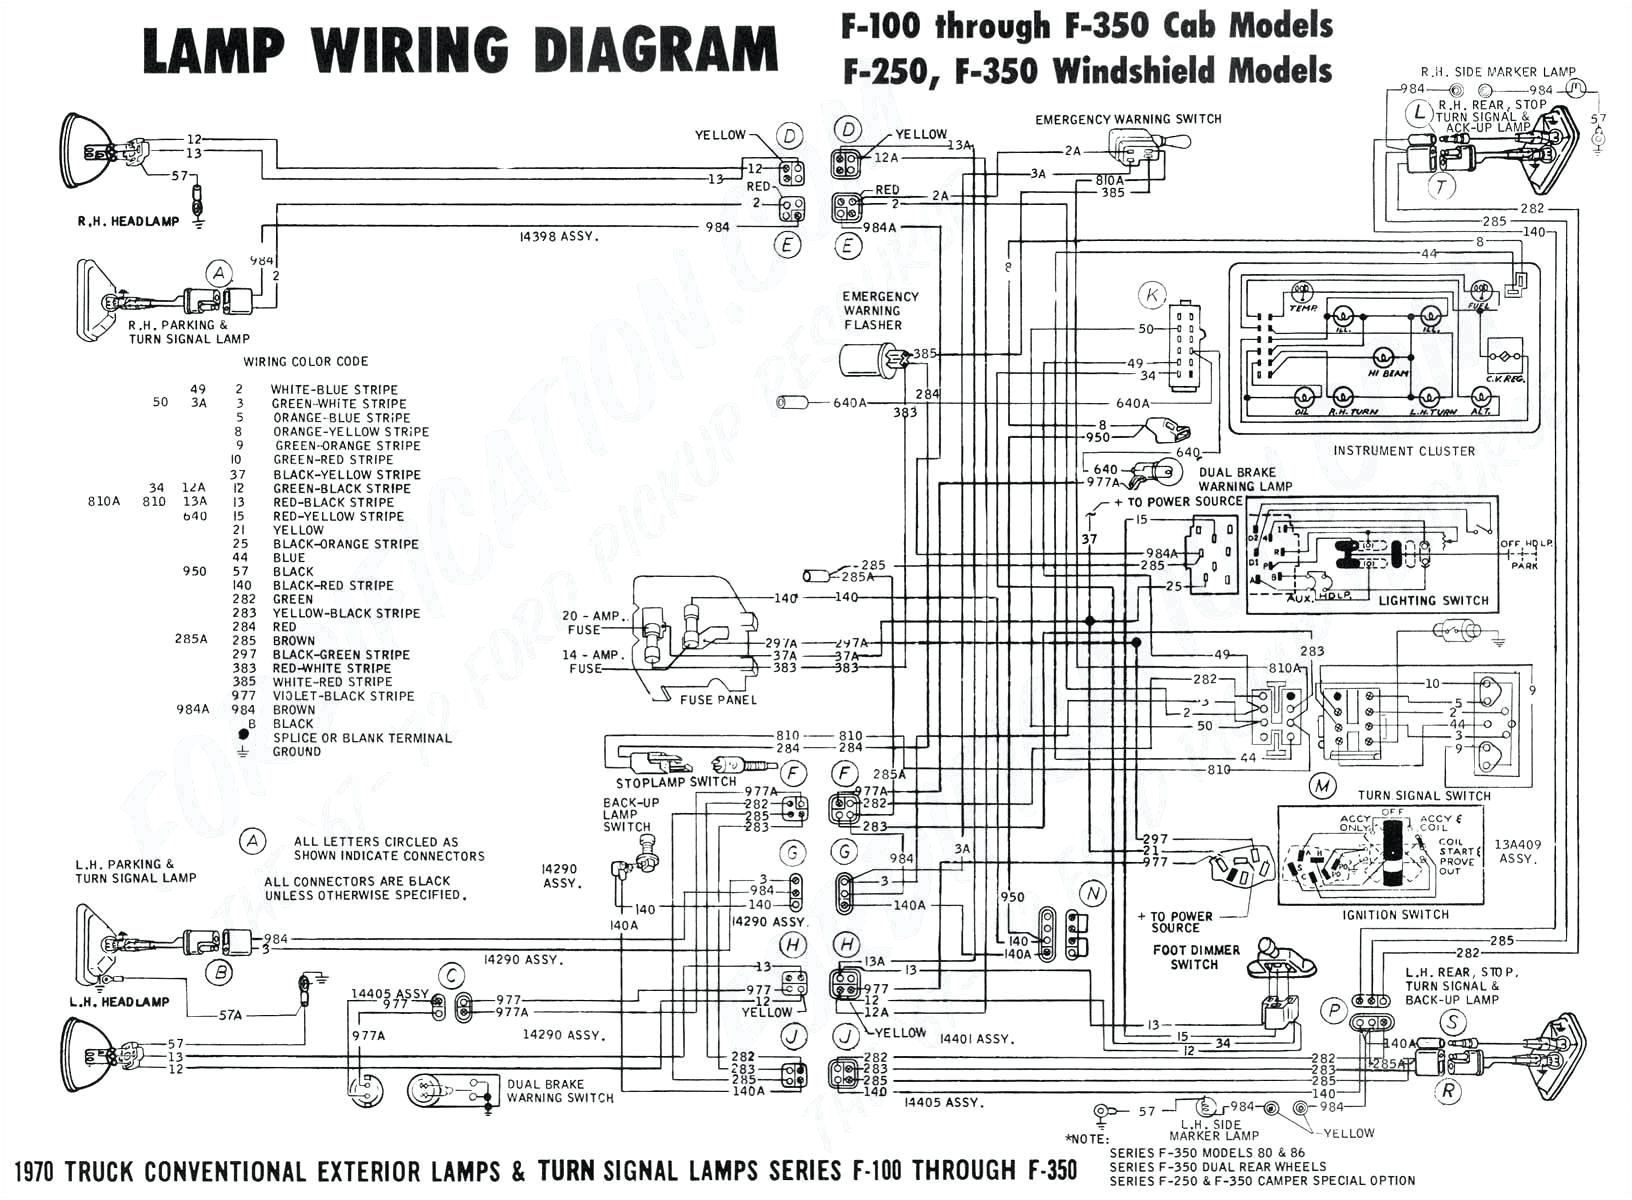 military turn switch wiring diagram schema diagram database mulitary tractor trailer wiring diagram